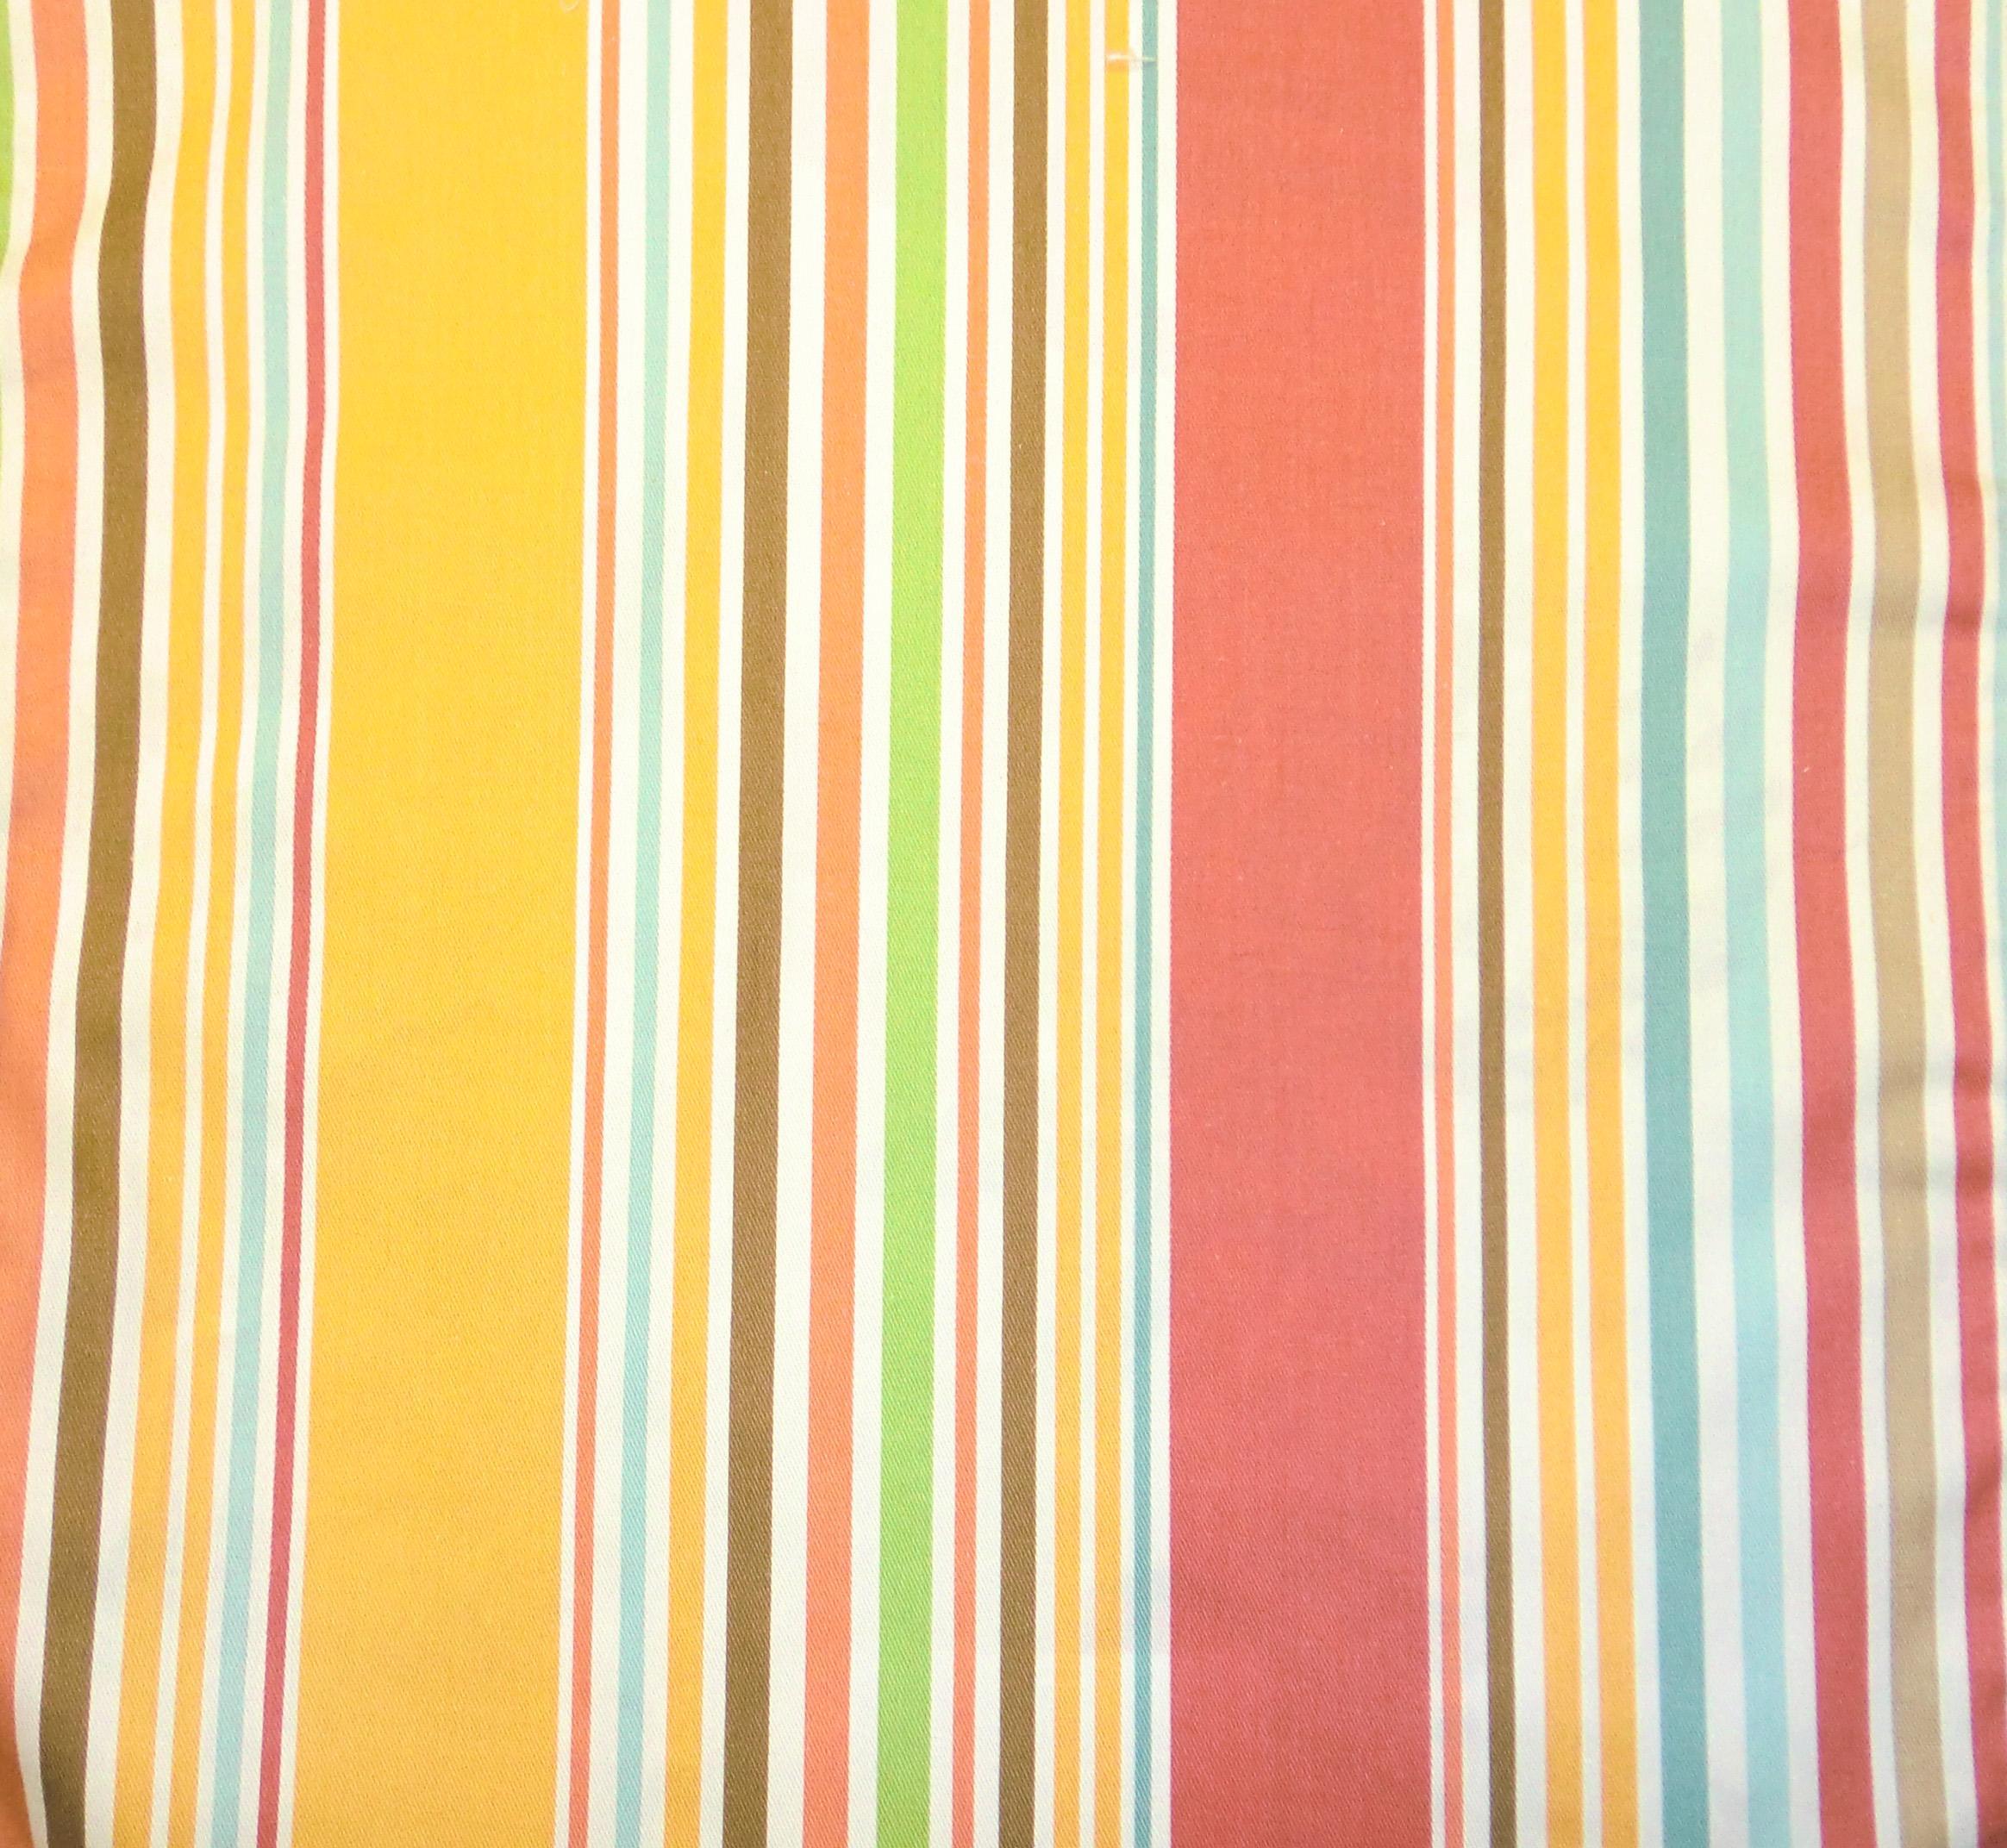 p kaufmann fabrics deck chair st shell. Black Bedroom Furniture Sets. Home Design Ideas